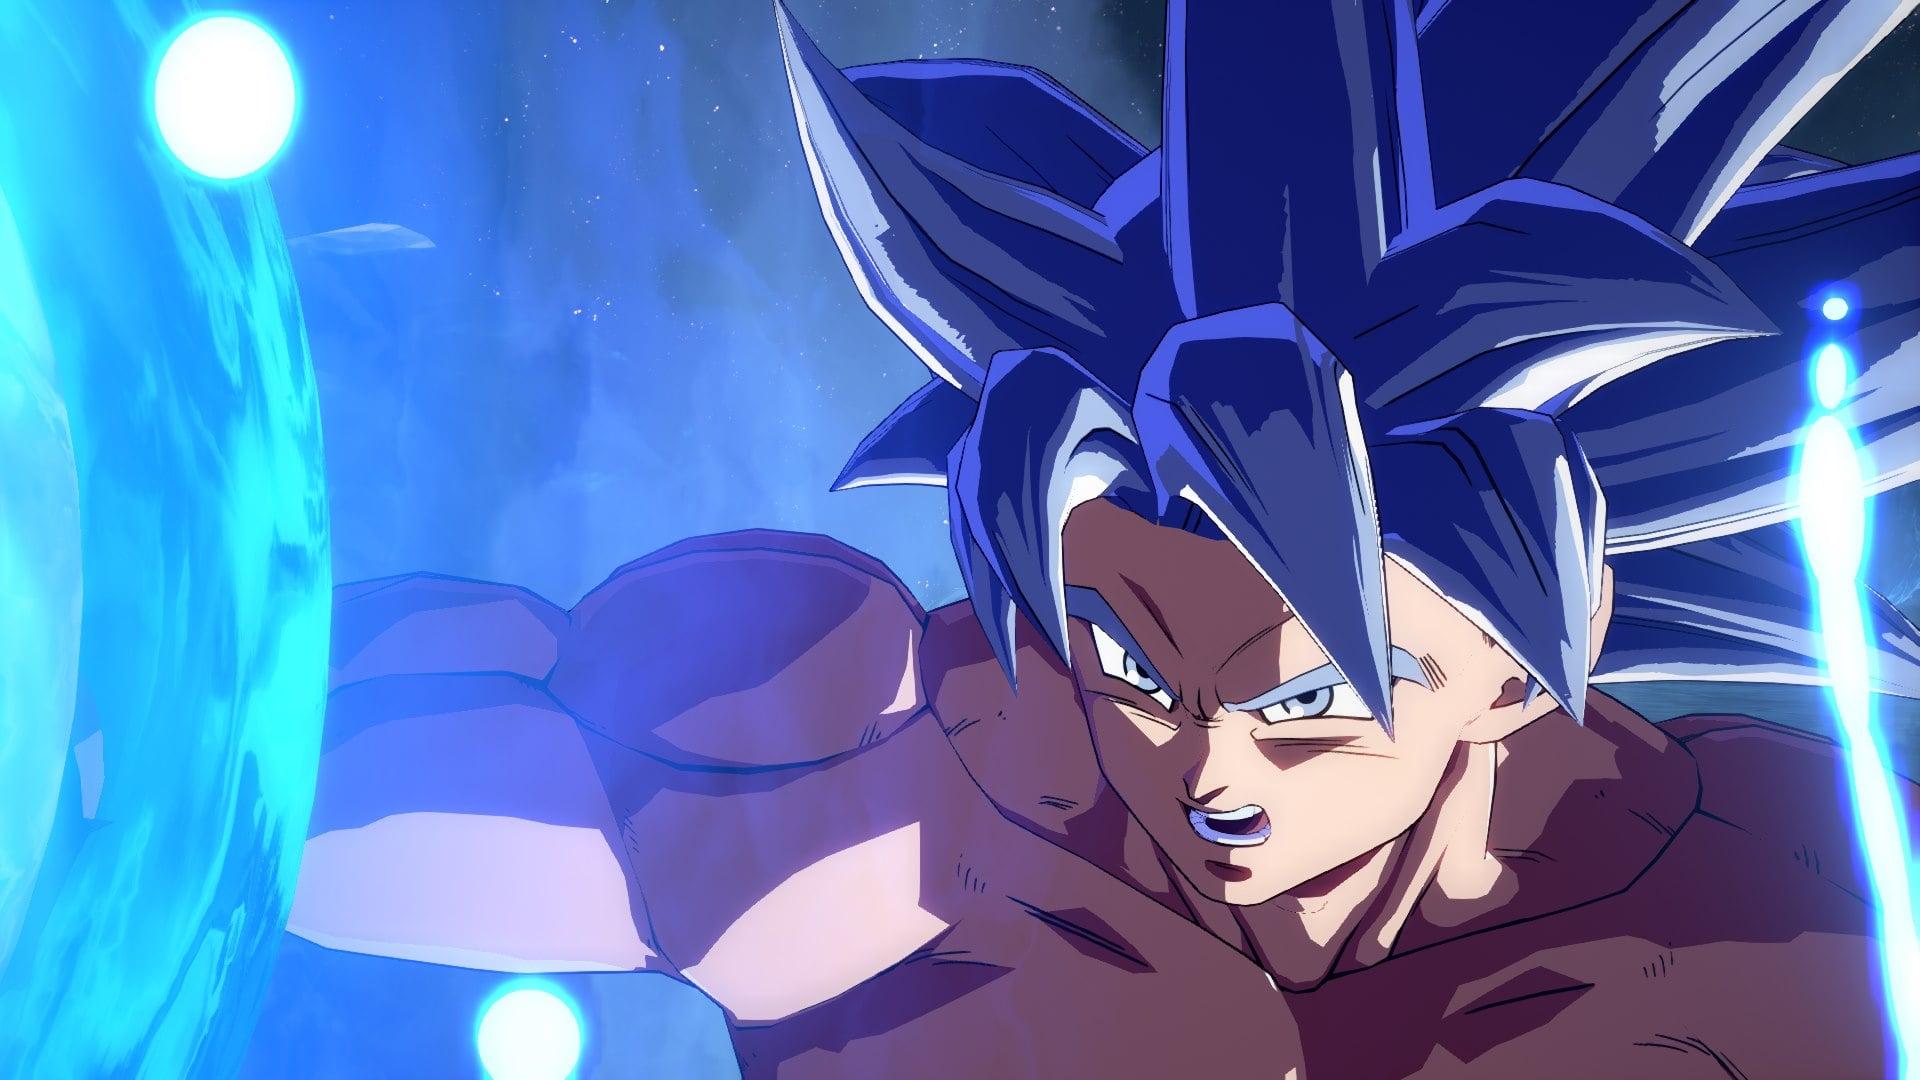 Dragon Ball Z FighterZ 2020 03 21 20 019 min